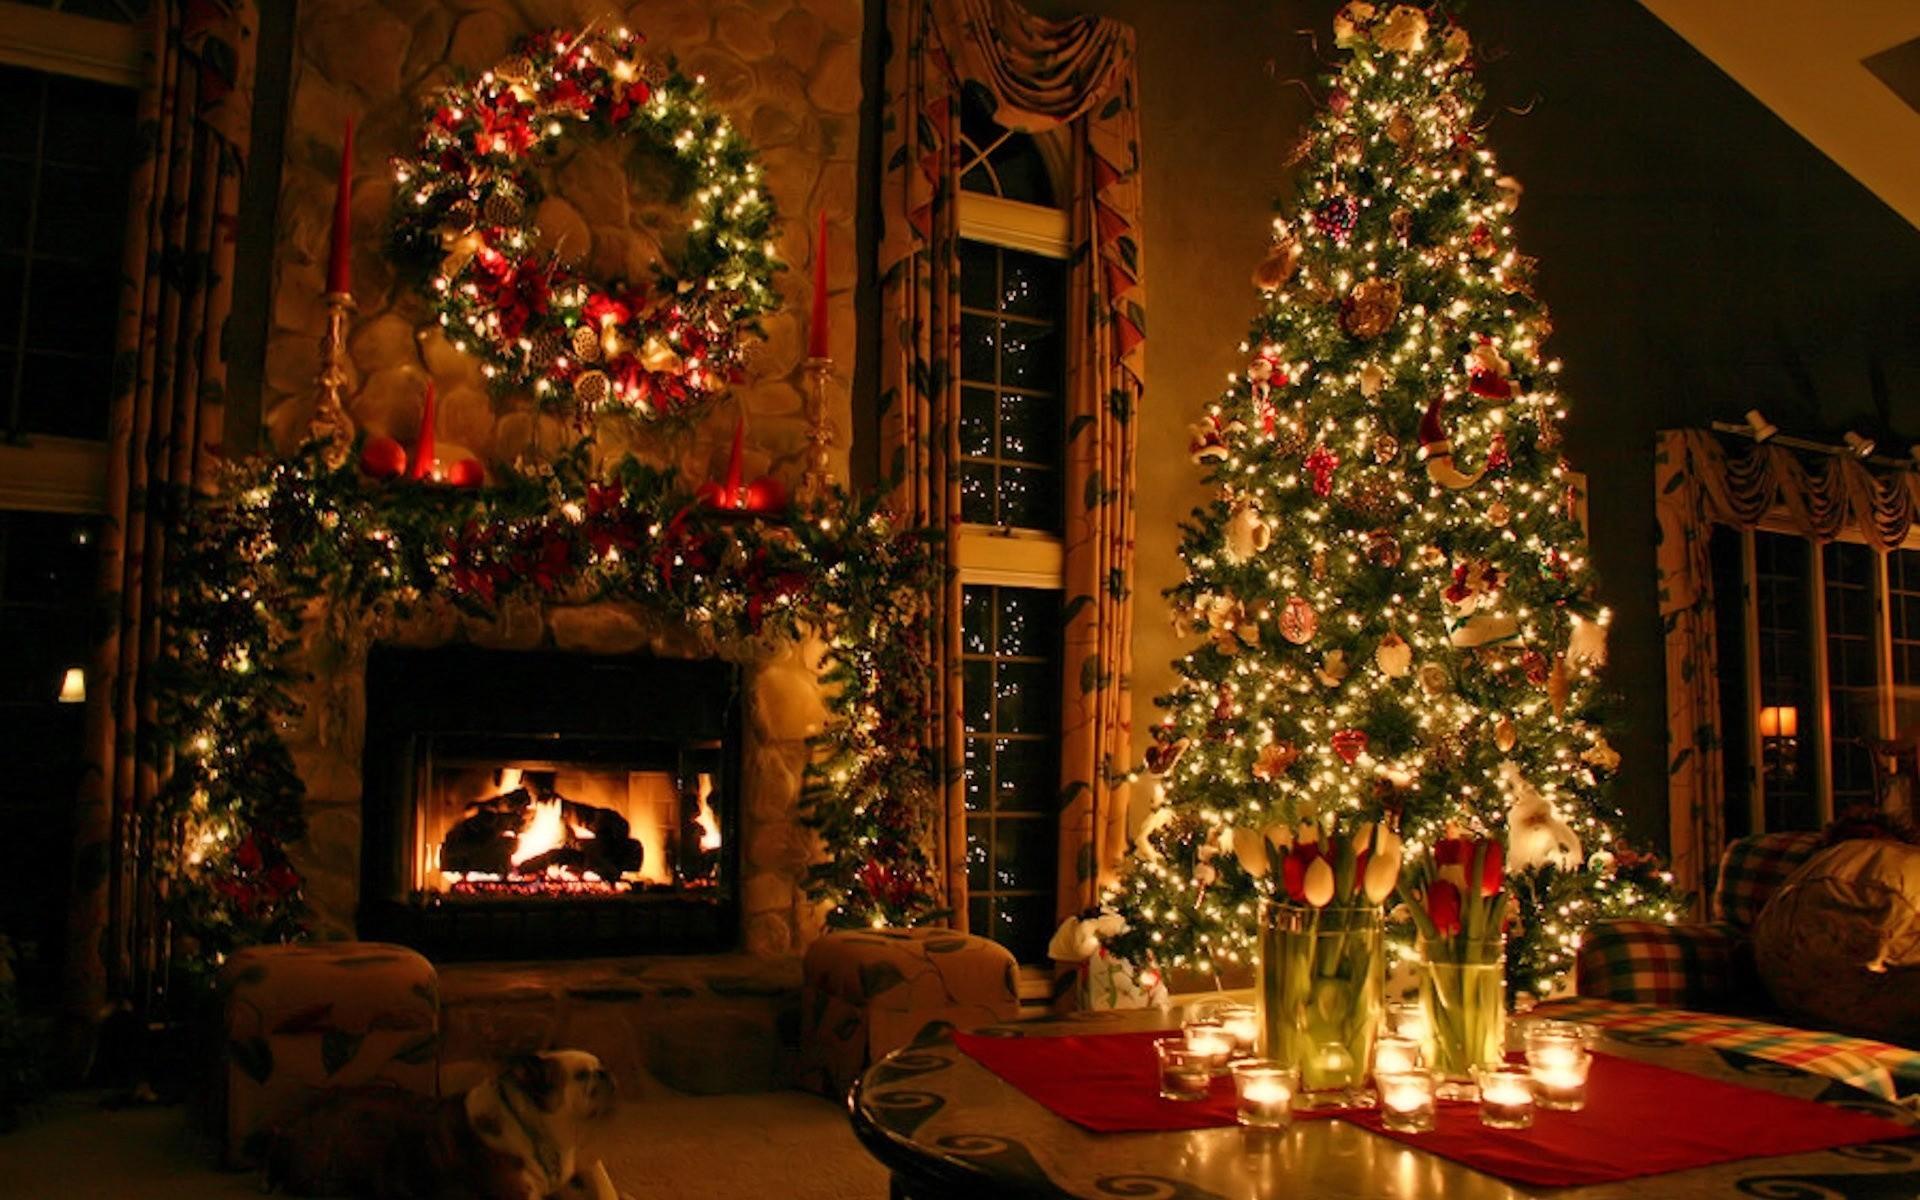 Christmas Desktop Holiday Wallpaper 79 Images